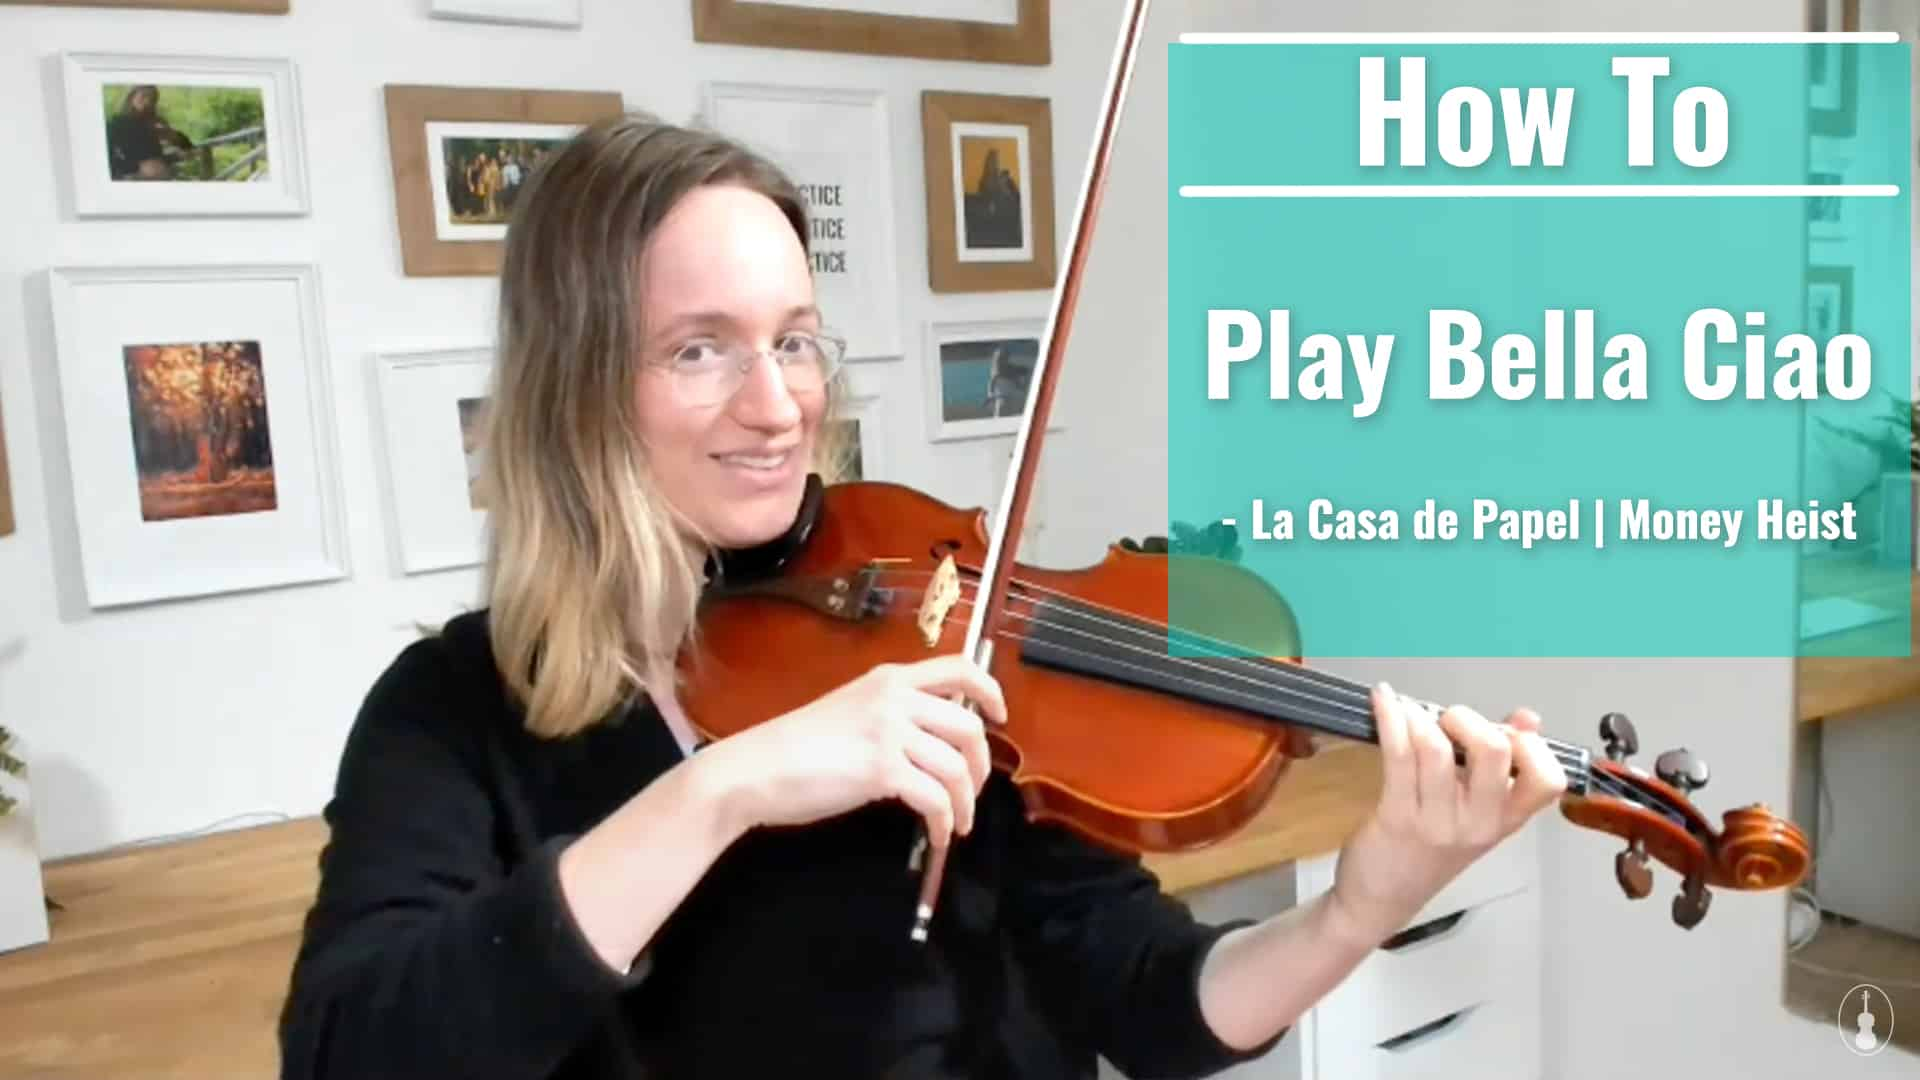 How to play Bella Ciao | La Casa de Papel | Money Heist